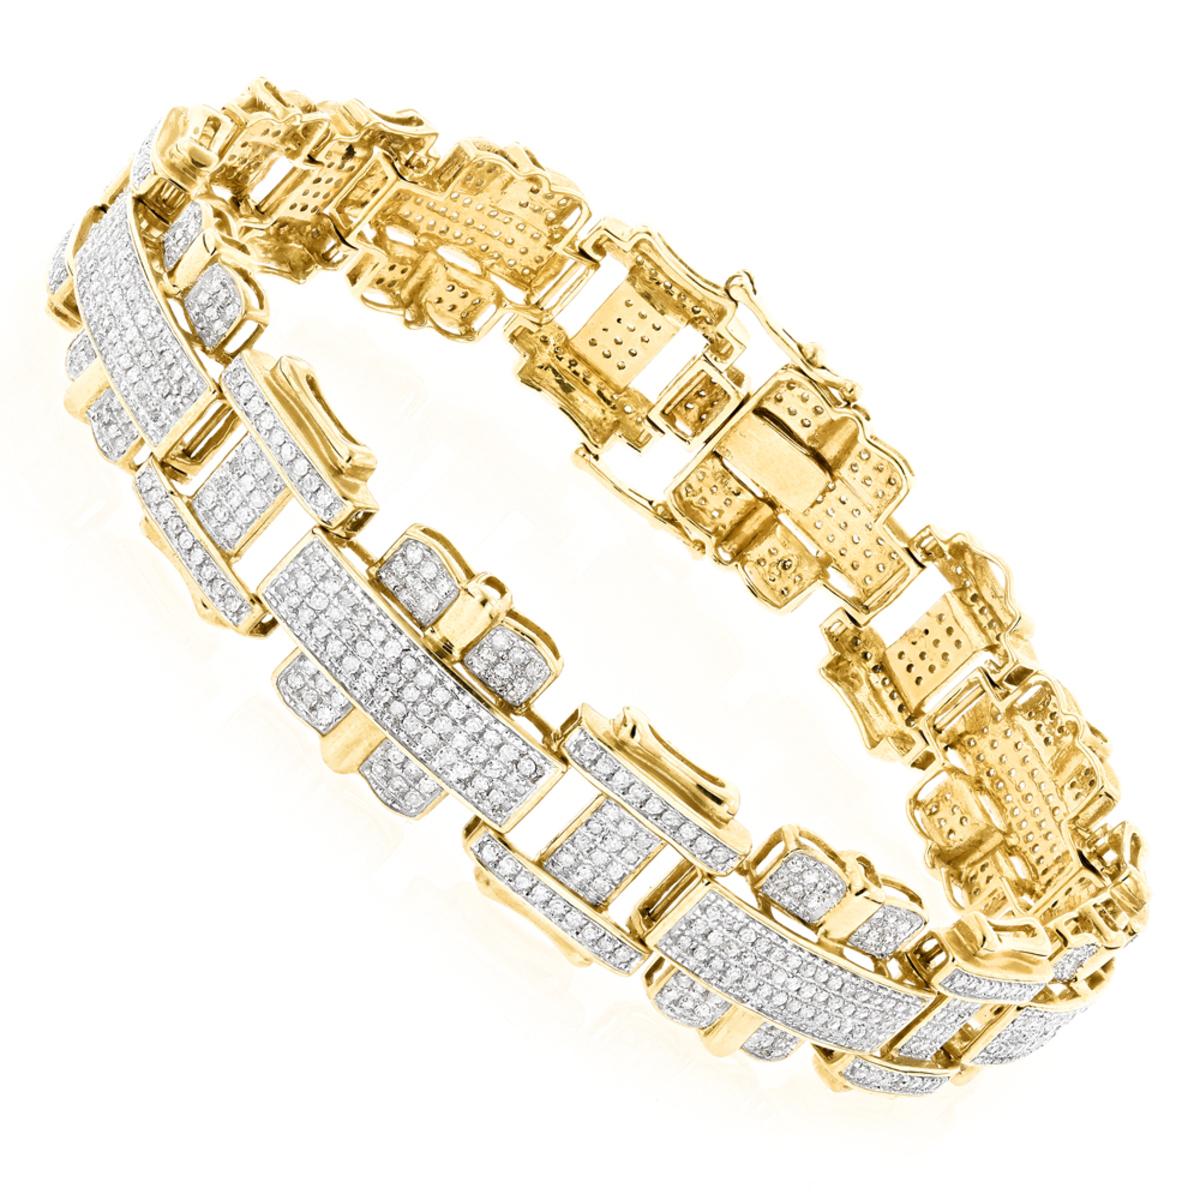 Mens Diamond Bracelet Jewelry 10K Gold 3ct